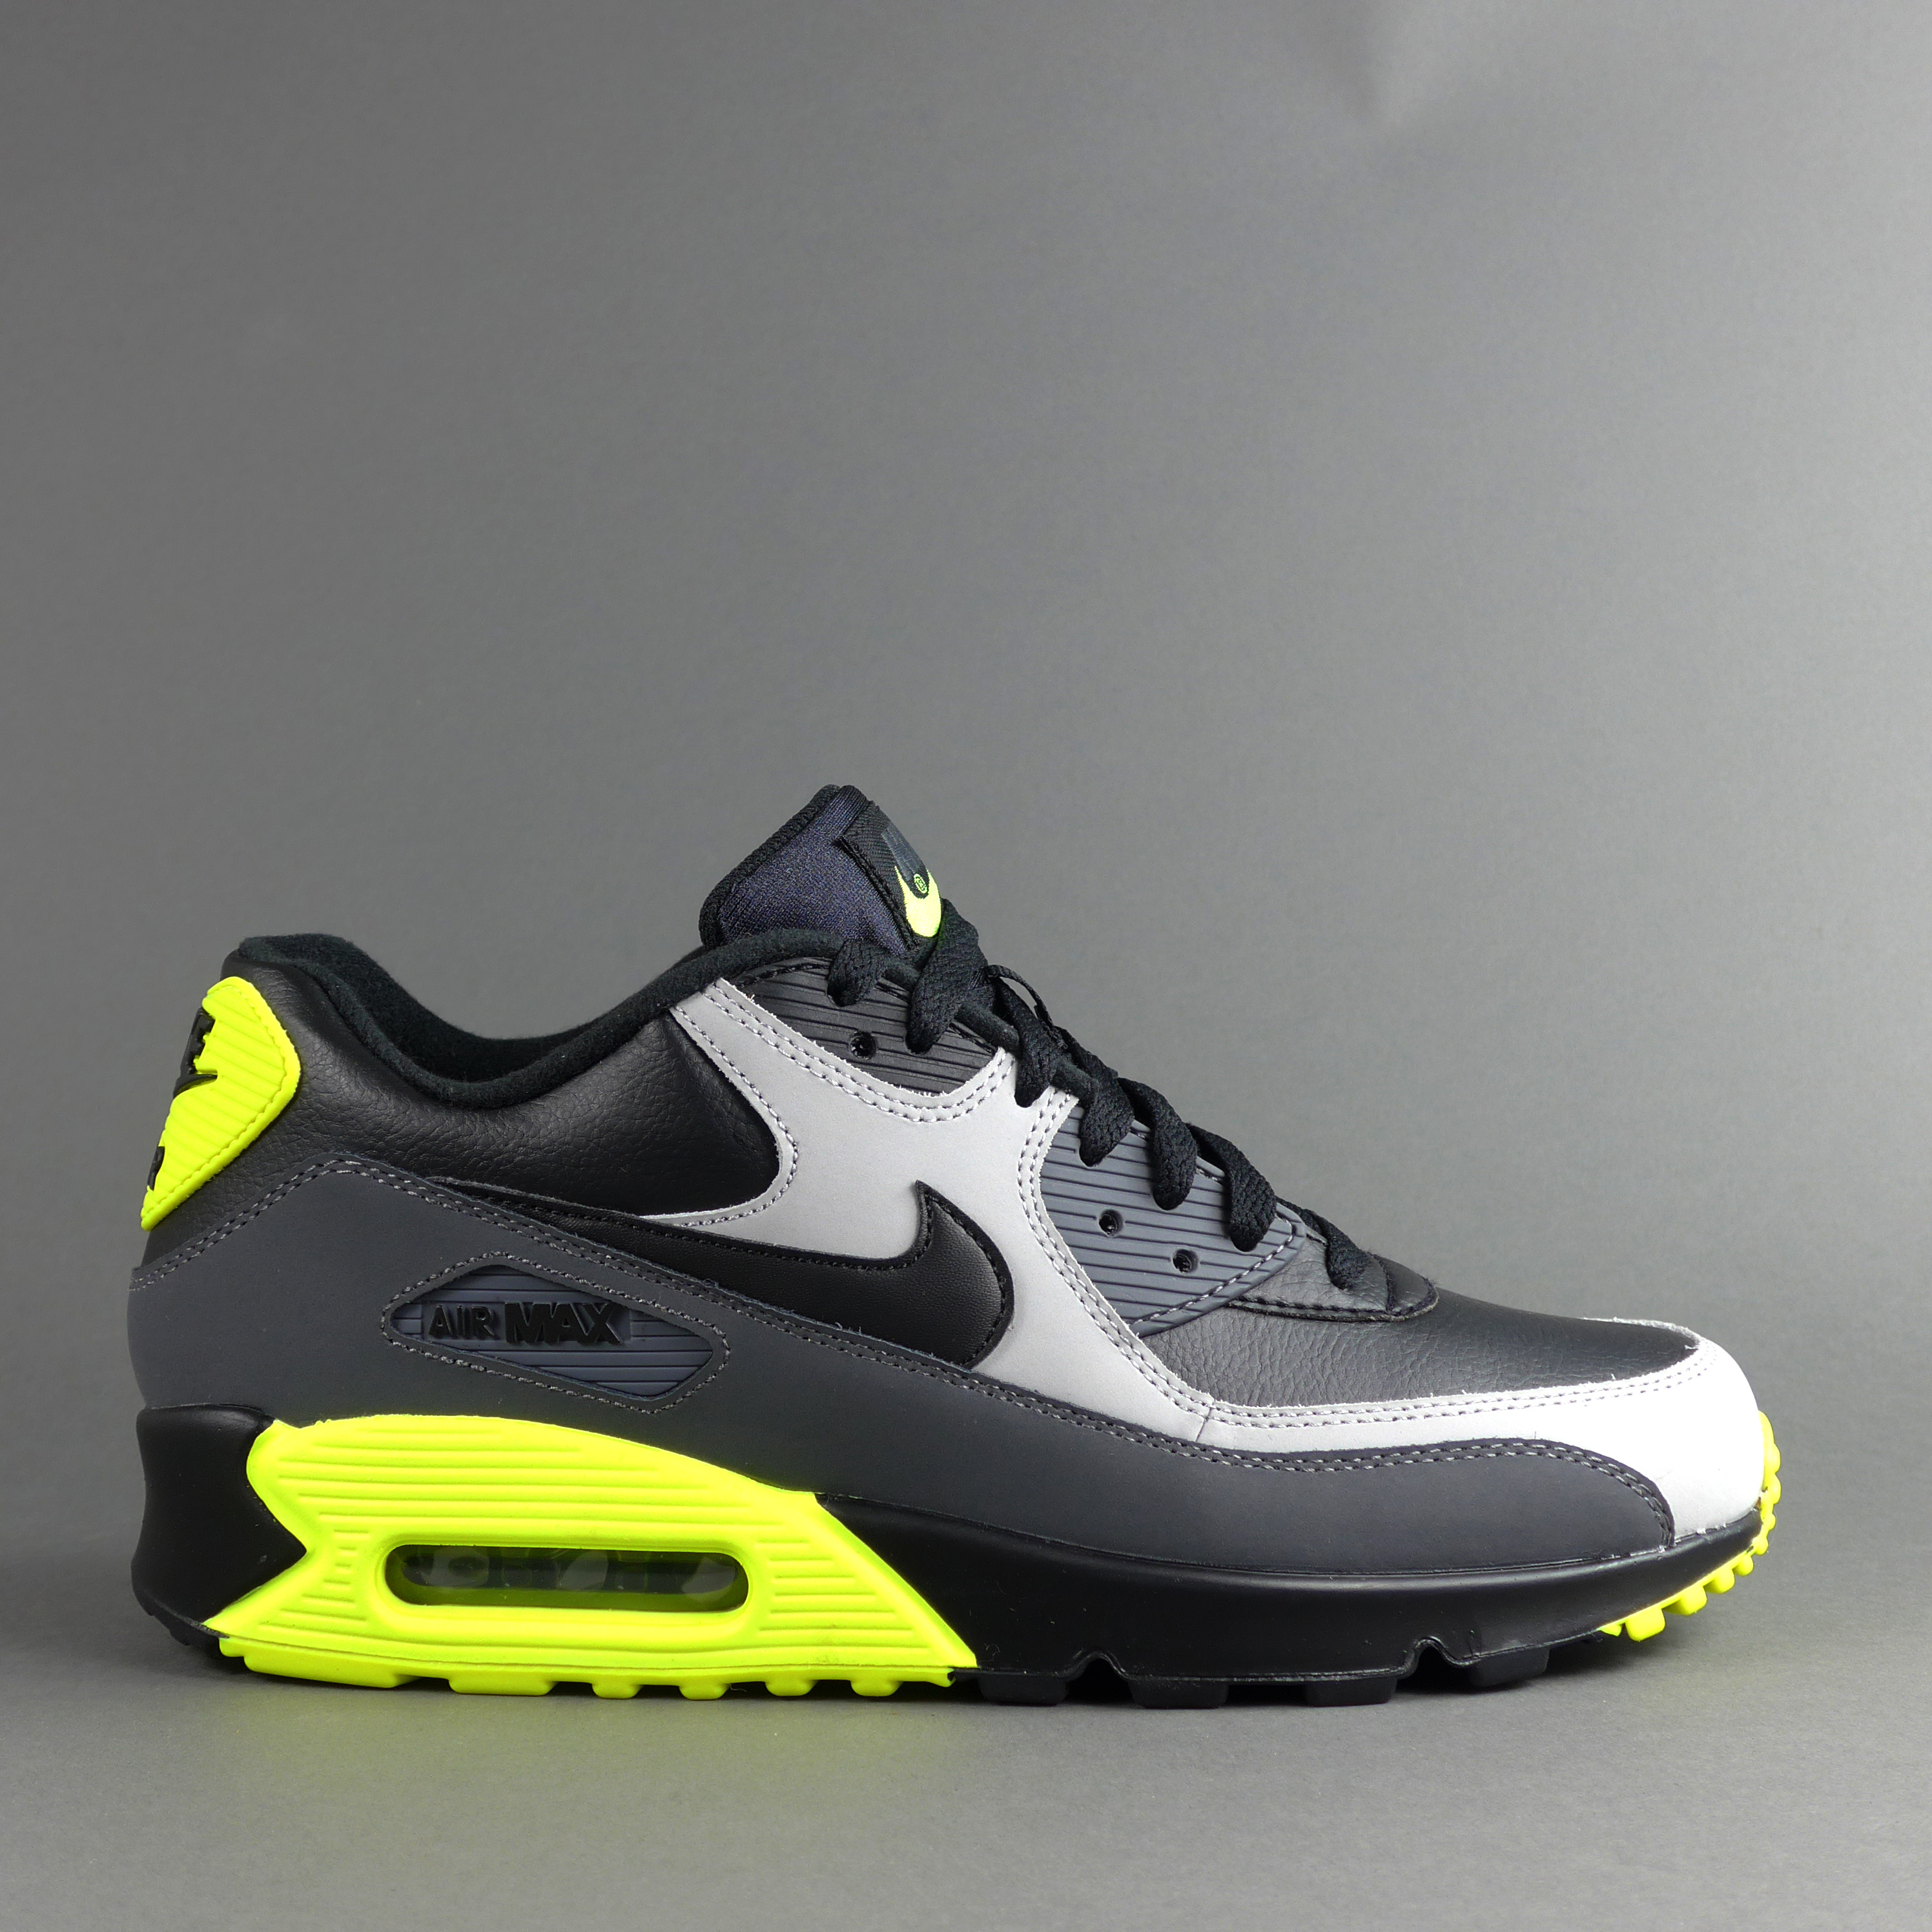 size 40 f9c0e 1155c Nike Air Max 90 Neu